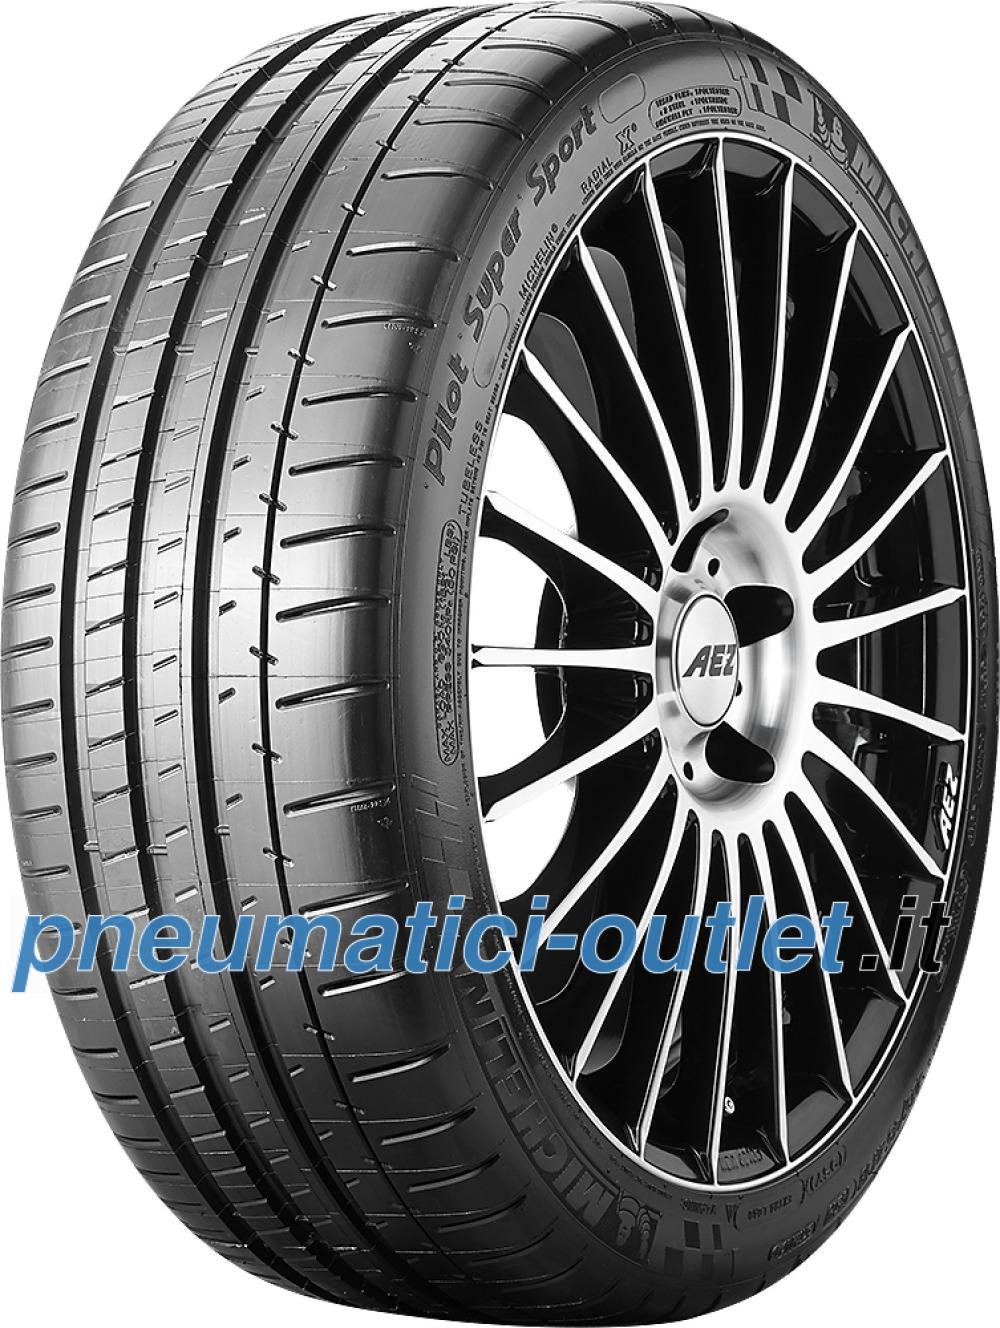 Michelin Pilot Super Sport ( 255/40 ZR18 (99Y) XL )